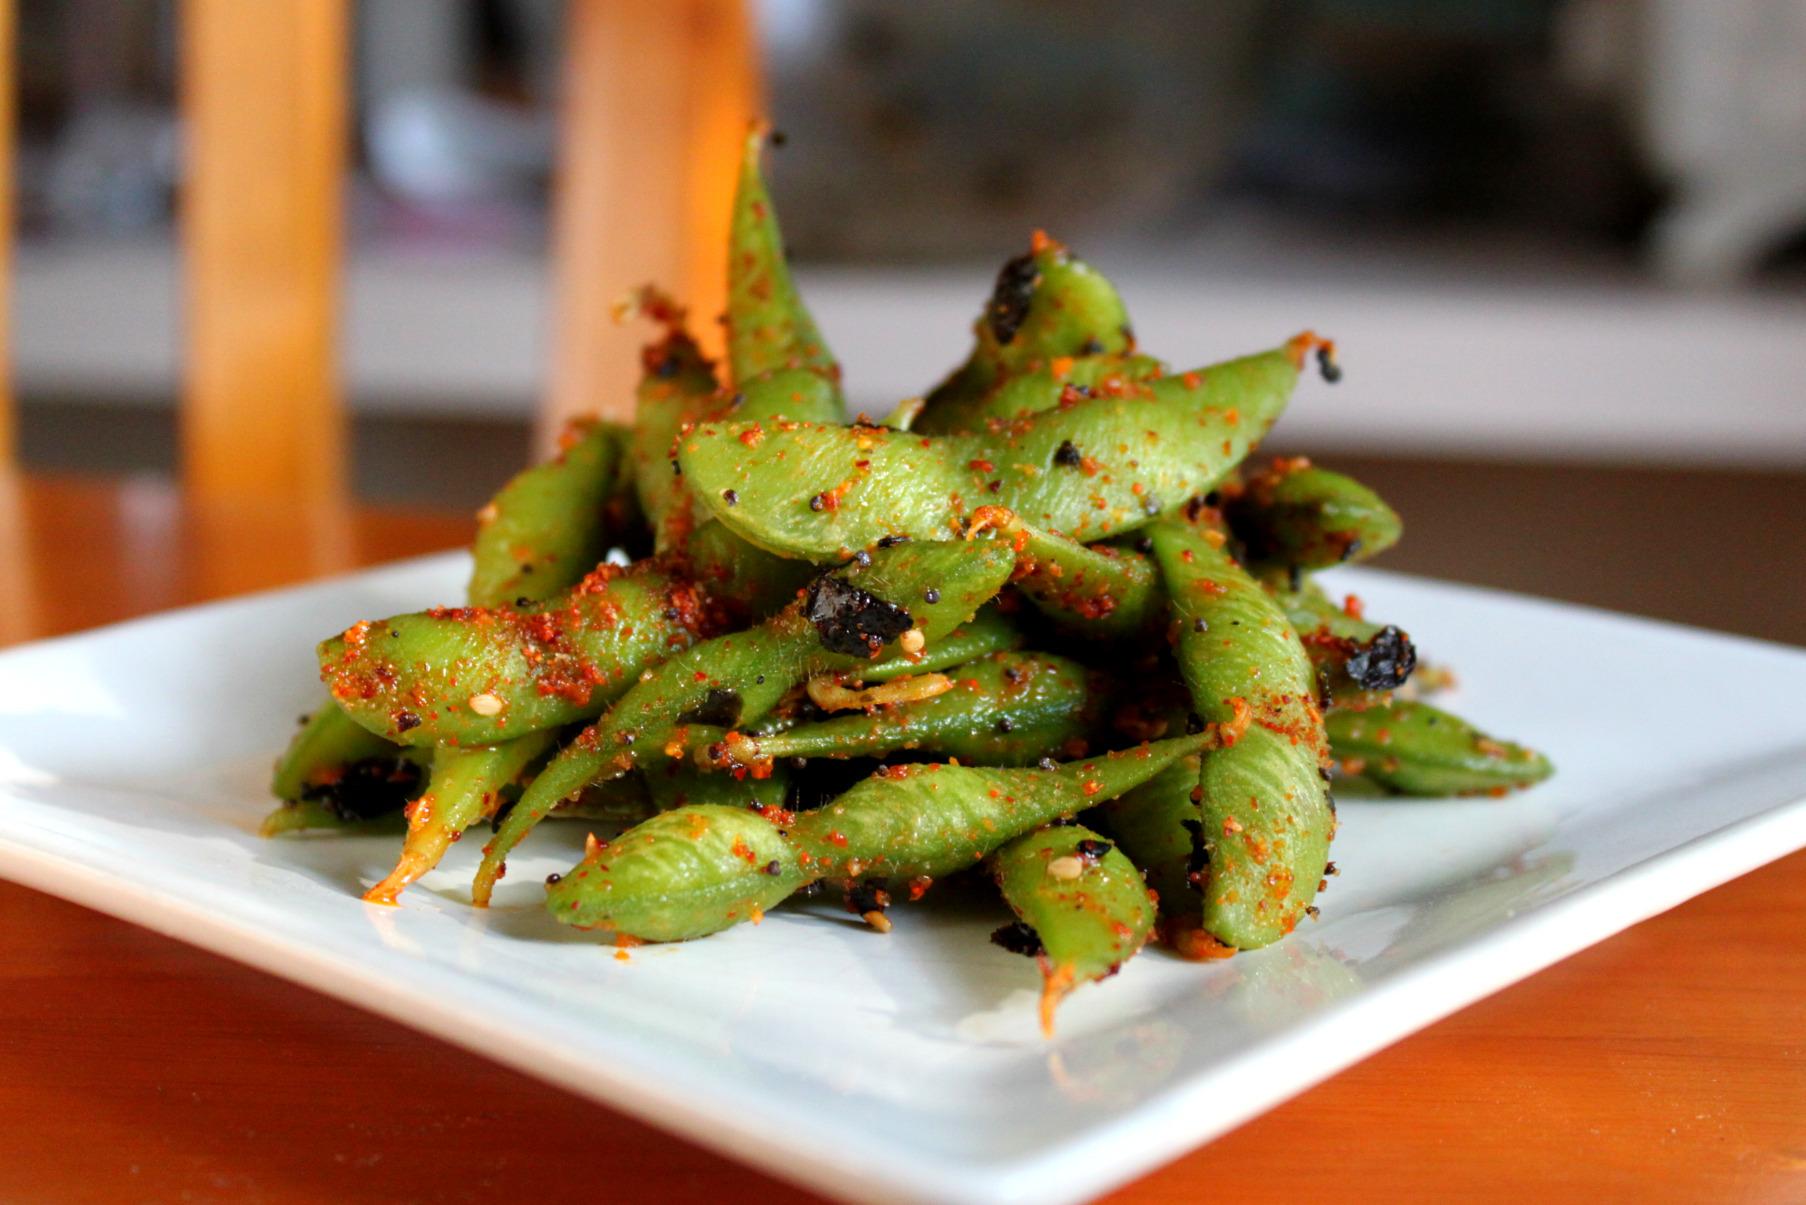 Spicy-Edamame-2.jpg